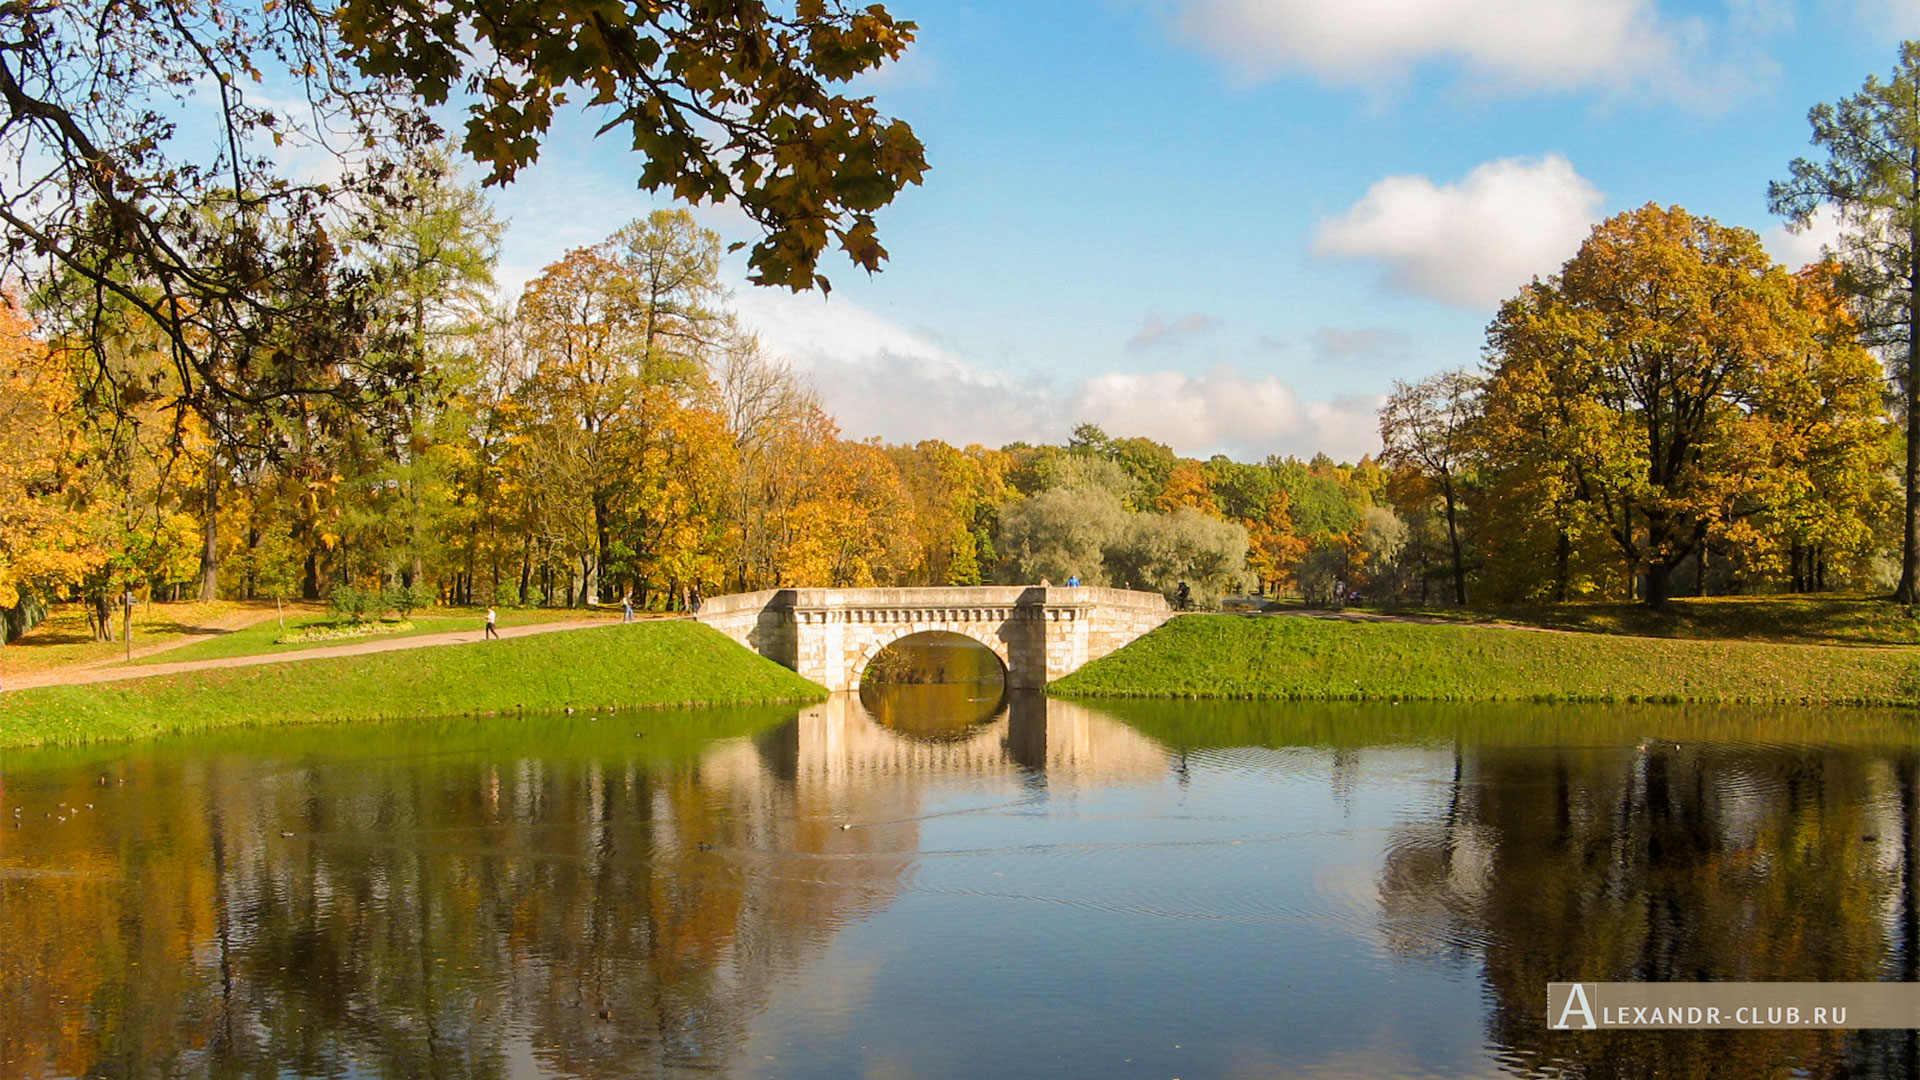 Гатчина, Гатчинский парк, осень, Карпин мост